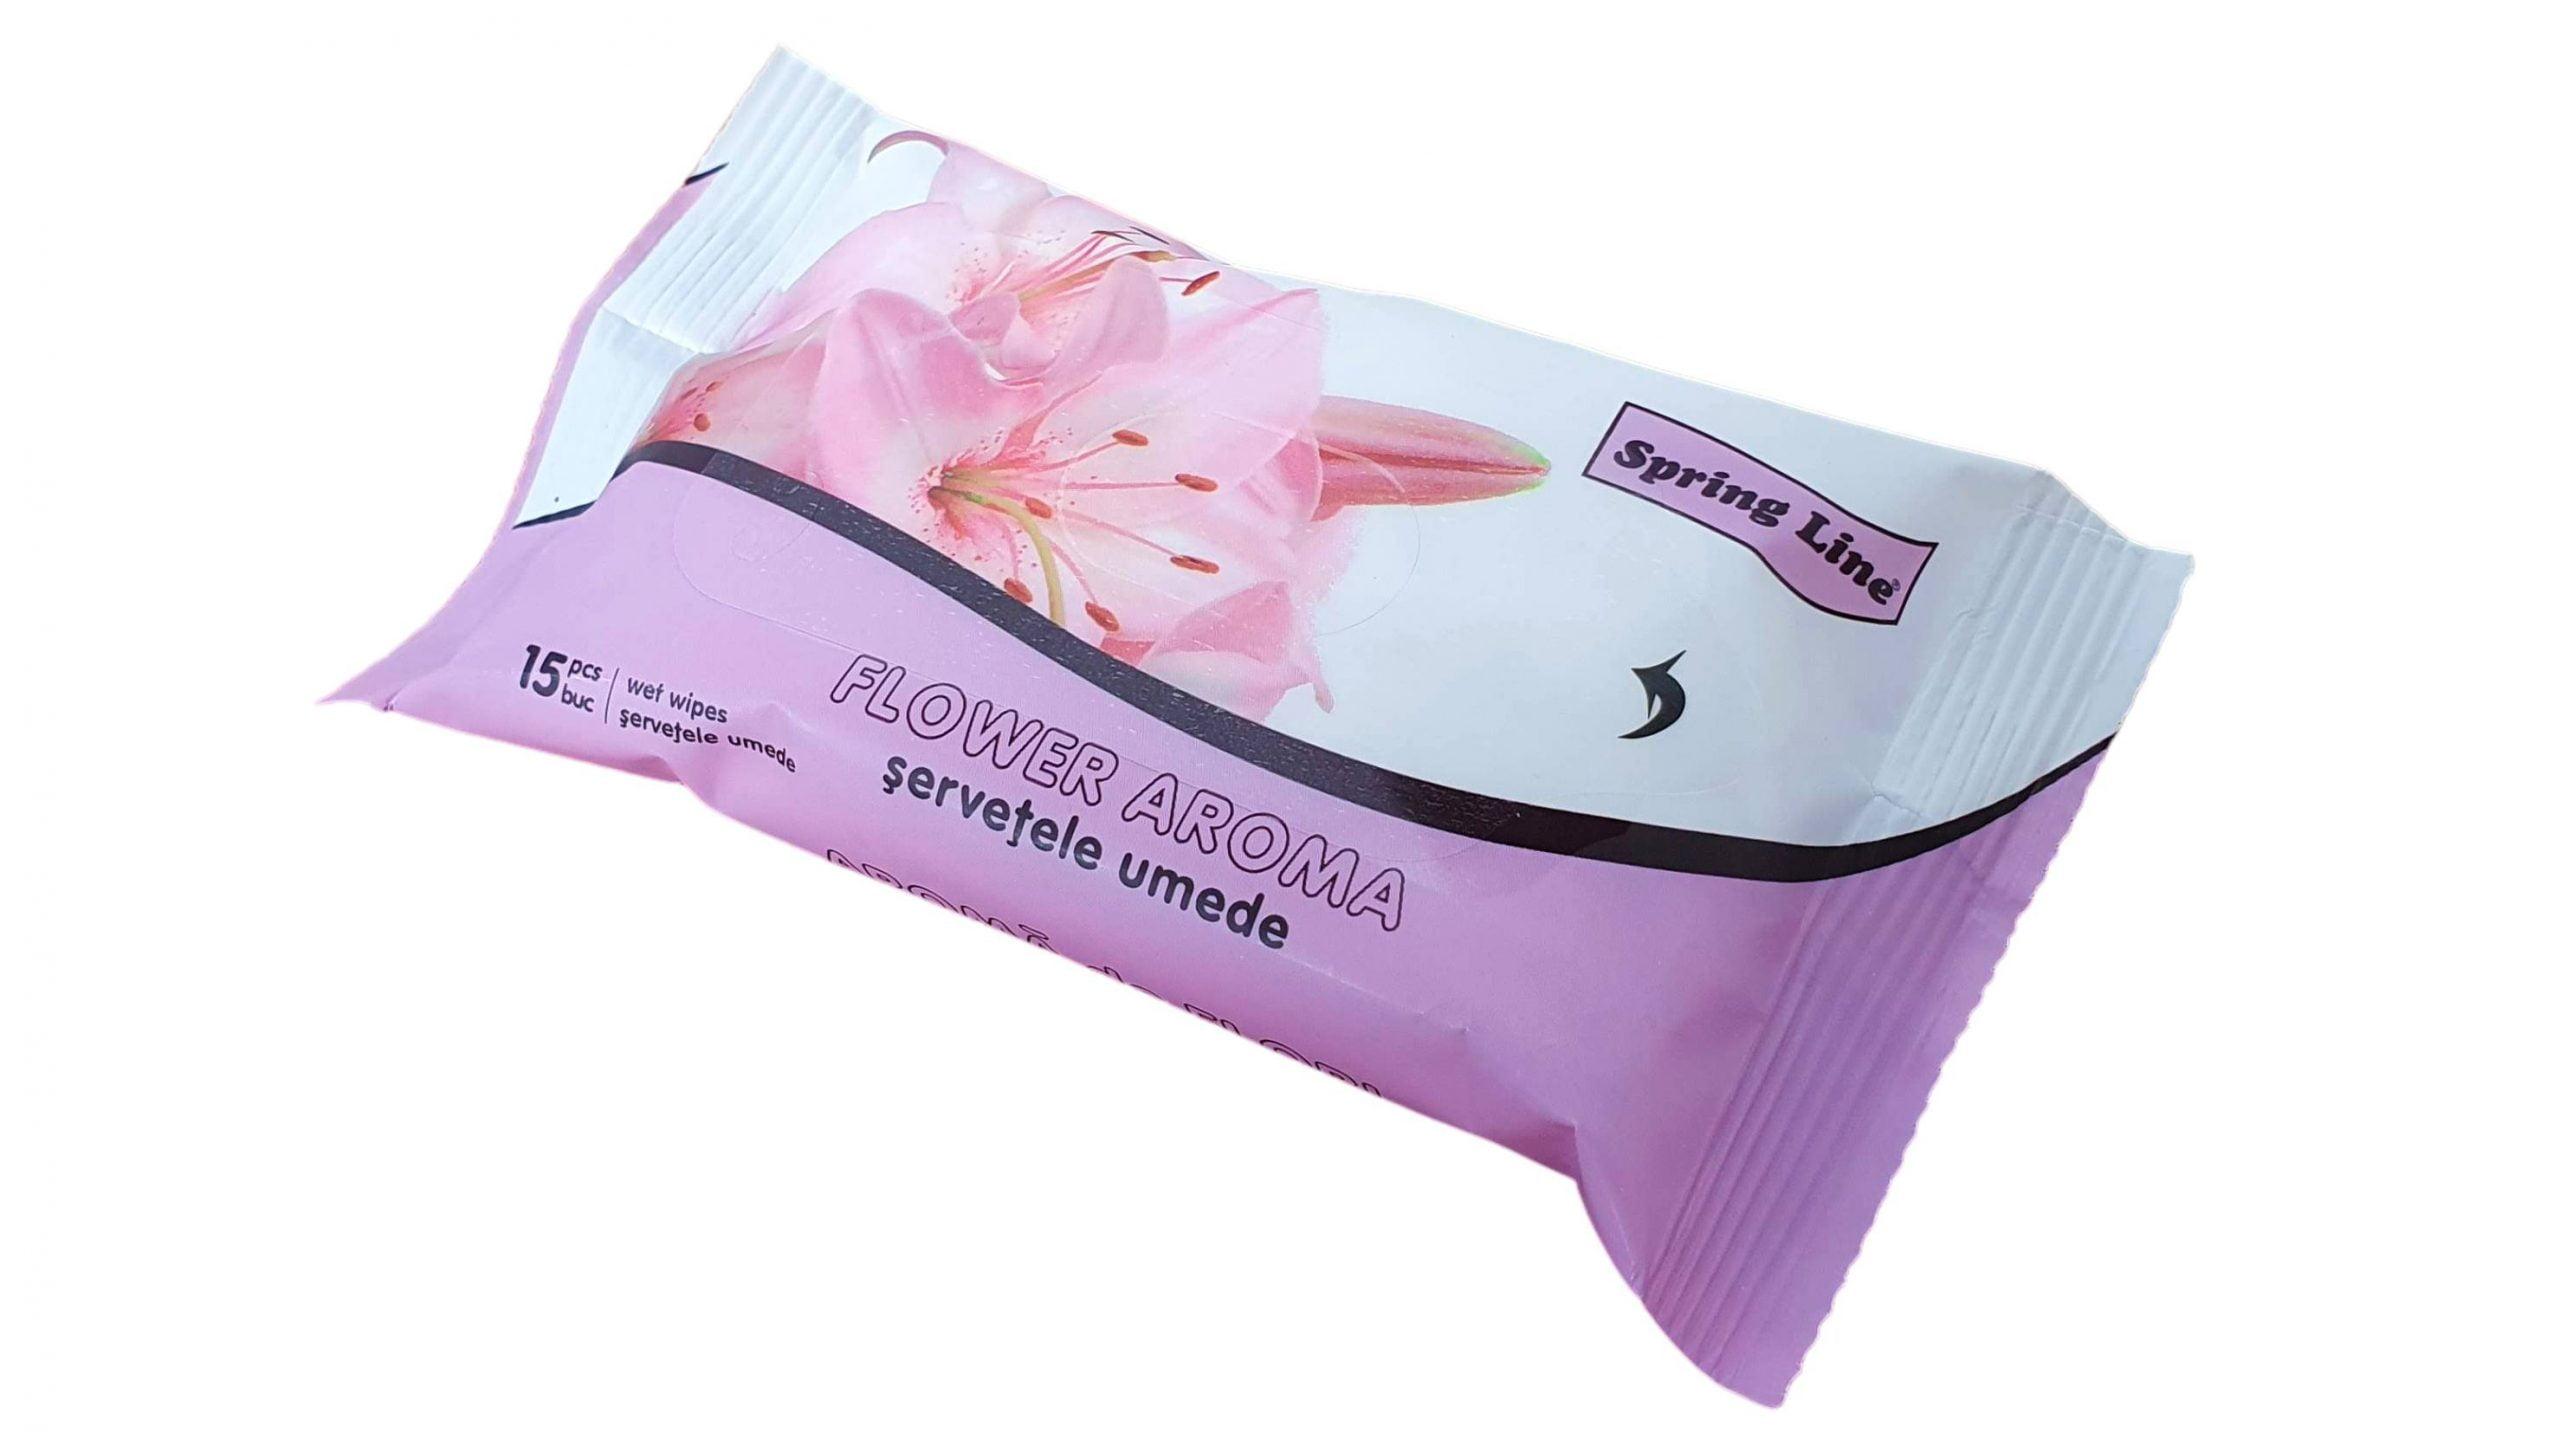 Servetele Umede Igienice Universale 15 buc Spring Line cu Aroma Florala imagine 2021 somnart.ro